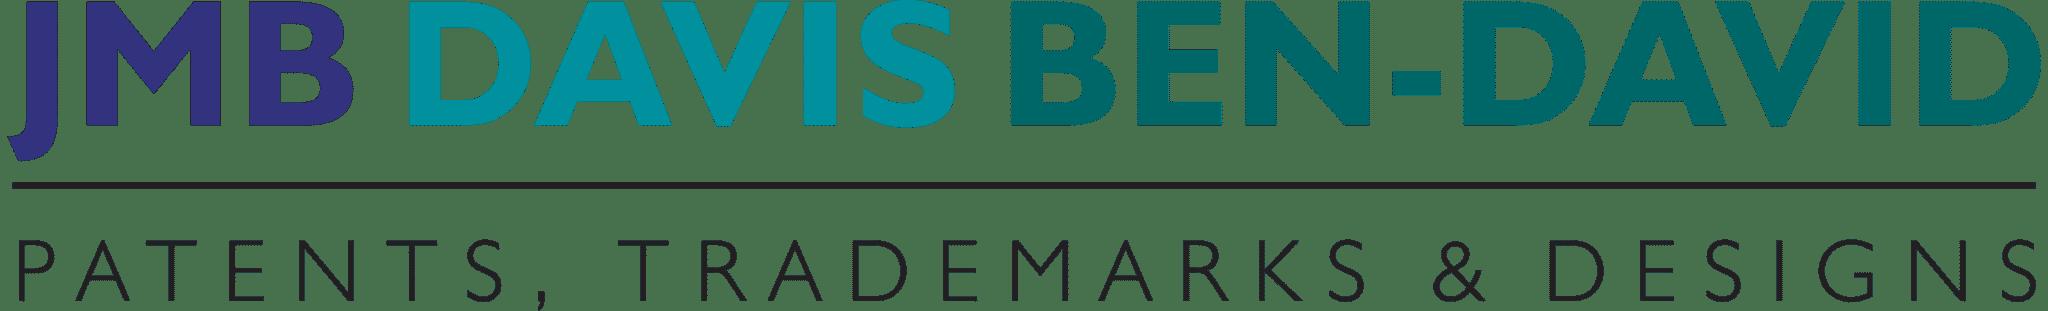 JMB-logo-avraham hermon